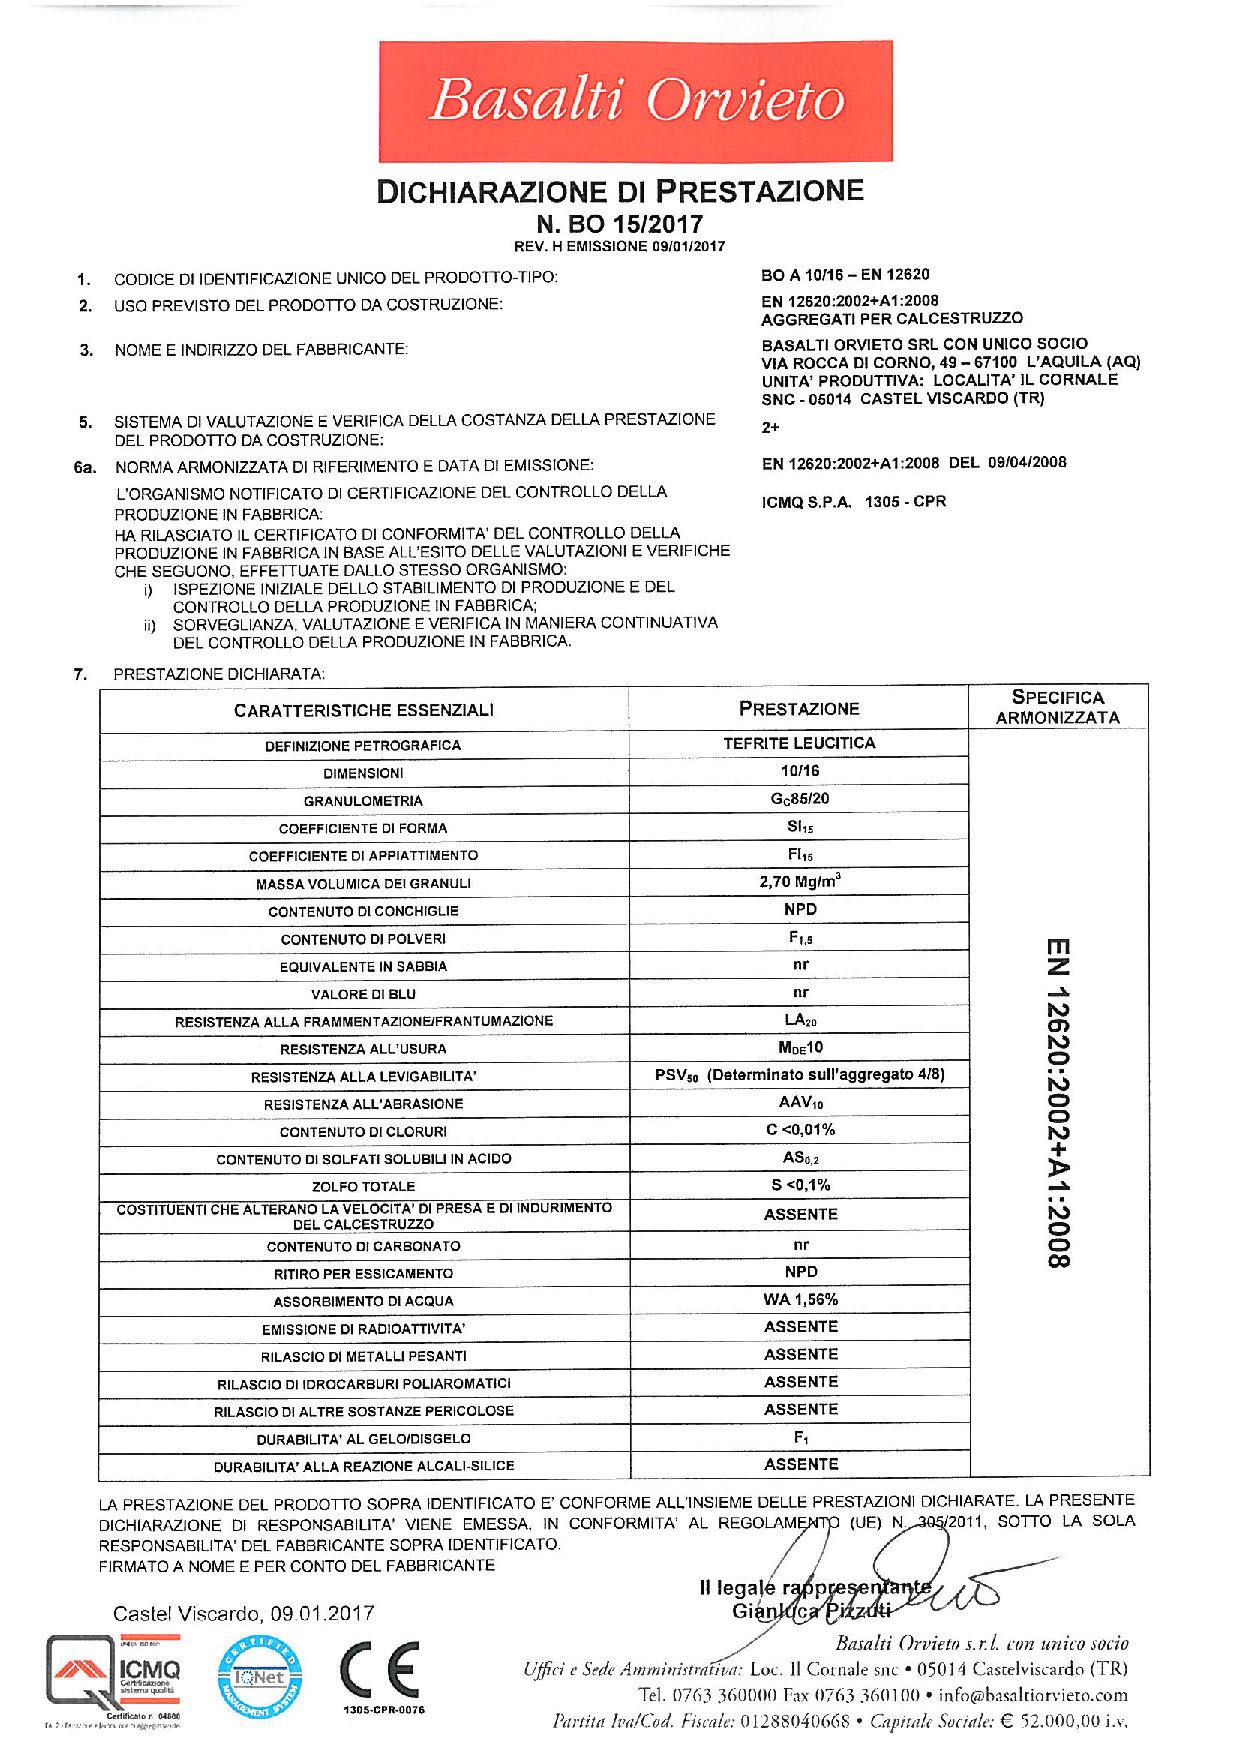 Calcestruzzo_DoP 10-16 - EN 12620